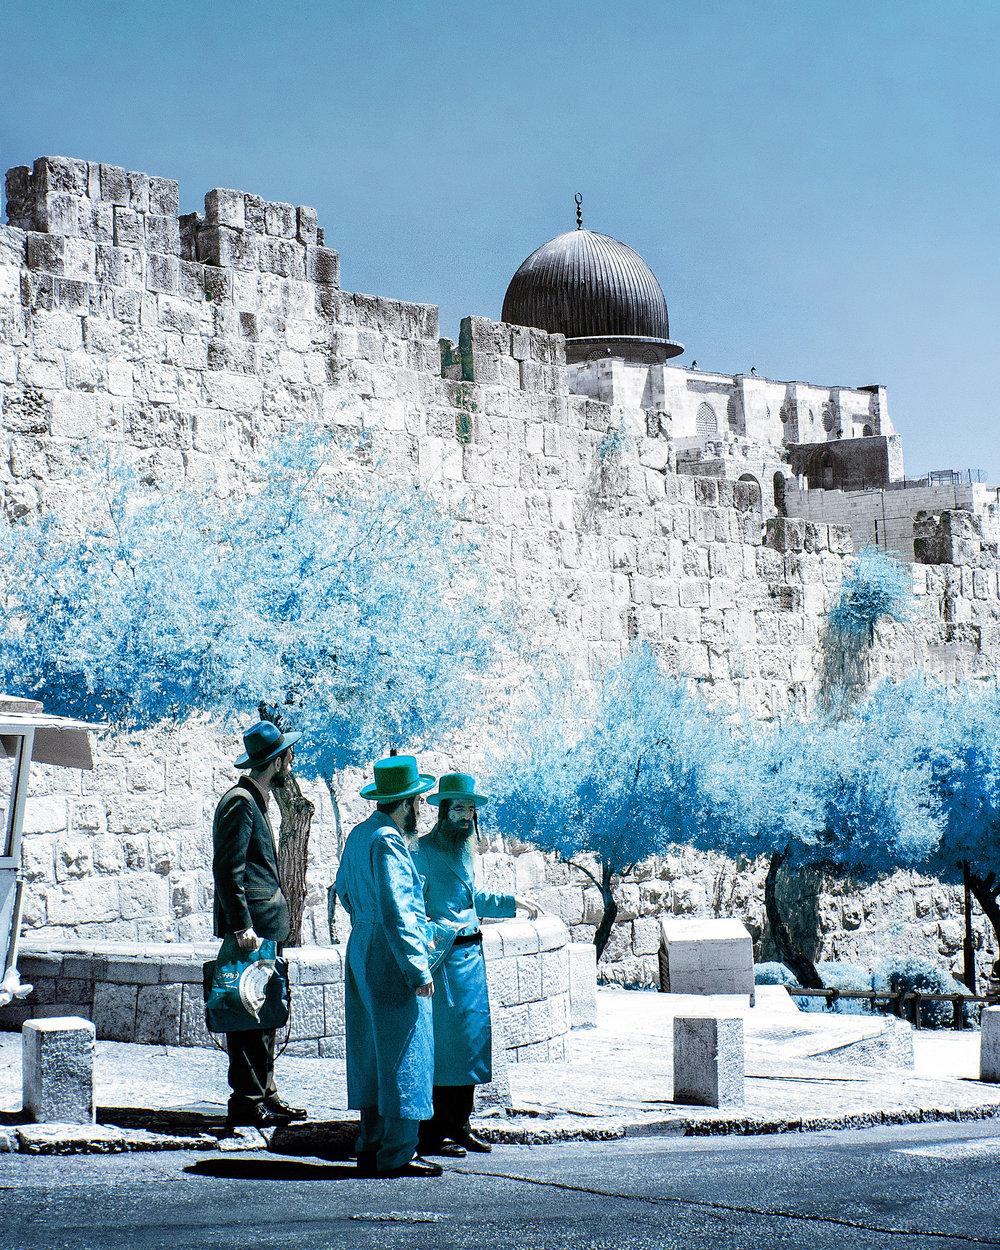 Rabbis in Blue